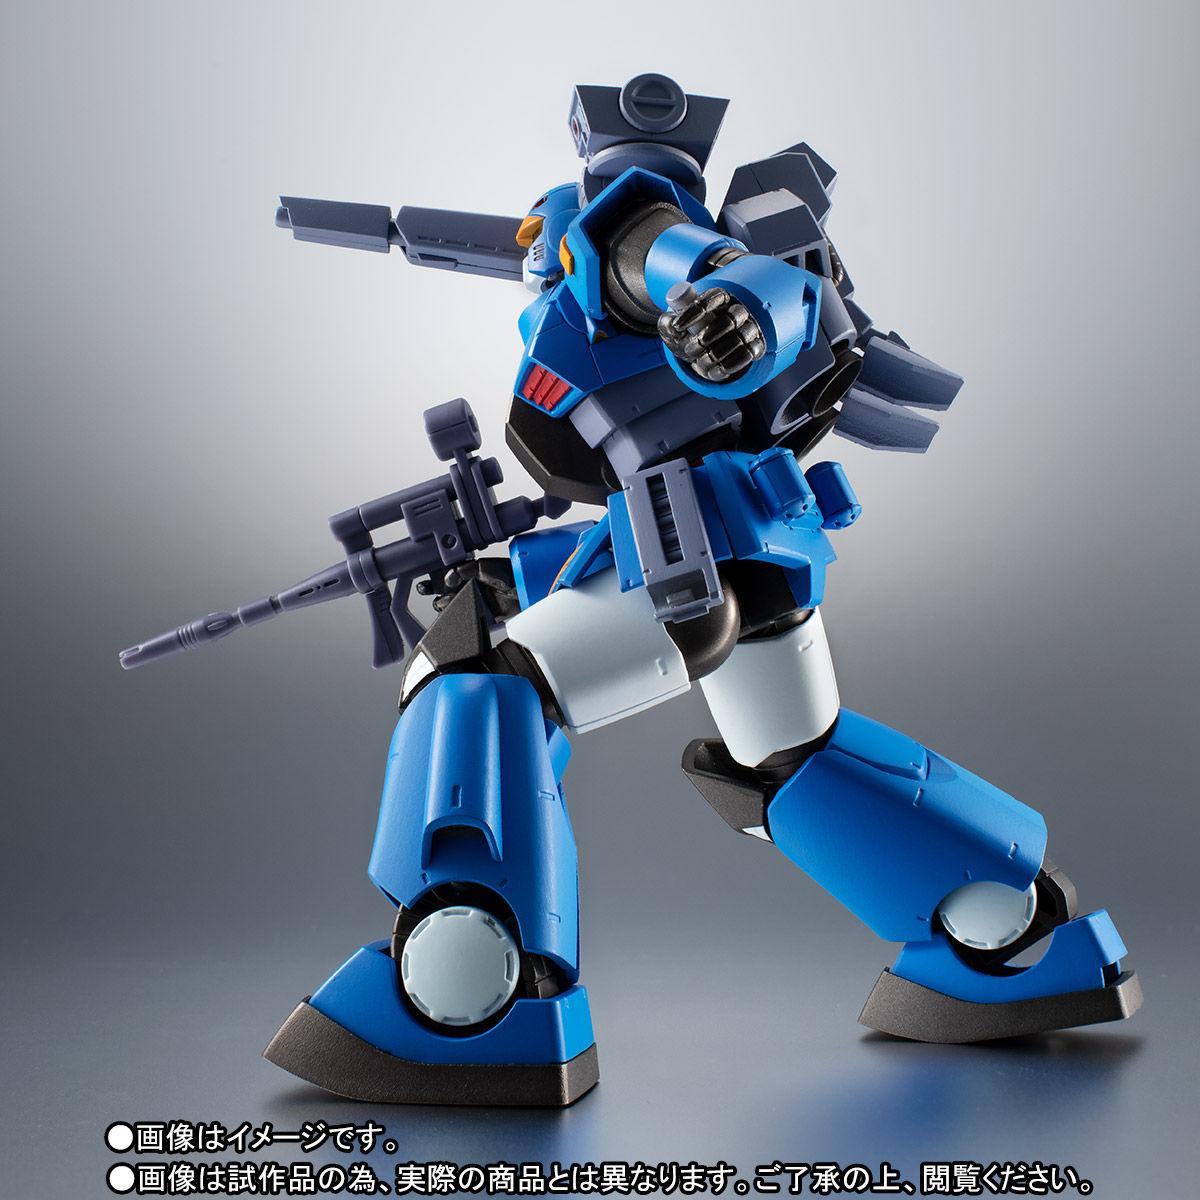 ROBOT魂〈SIDE MS〉『RX-77-3 ガンキャノン重装型 ver. A.N.I.M.E.』ガンダムMSV 可動フィギュア-007